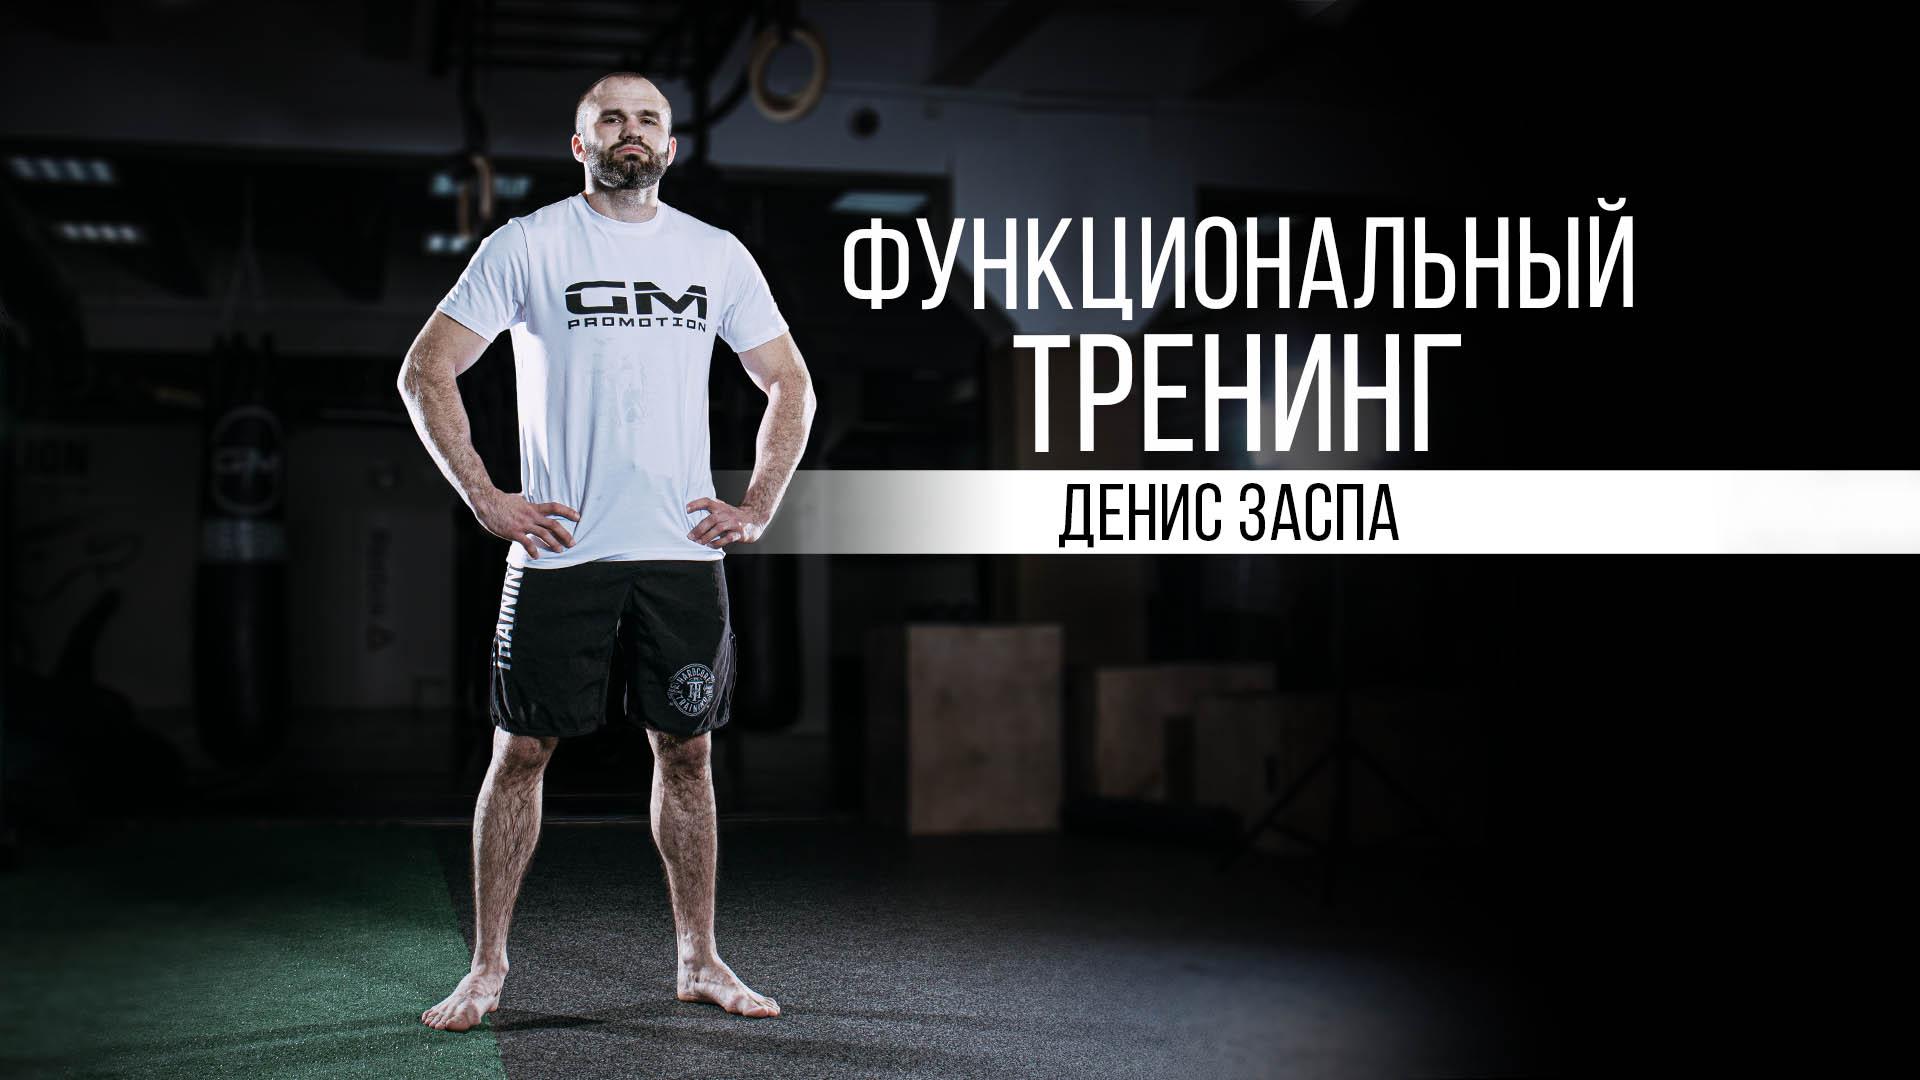 Денис Заспа Тренер по функциональному тренингу